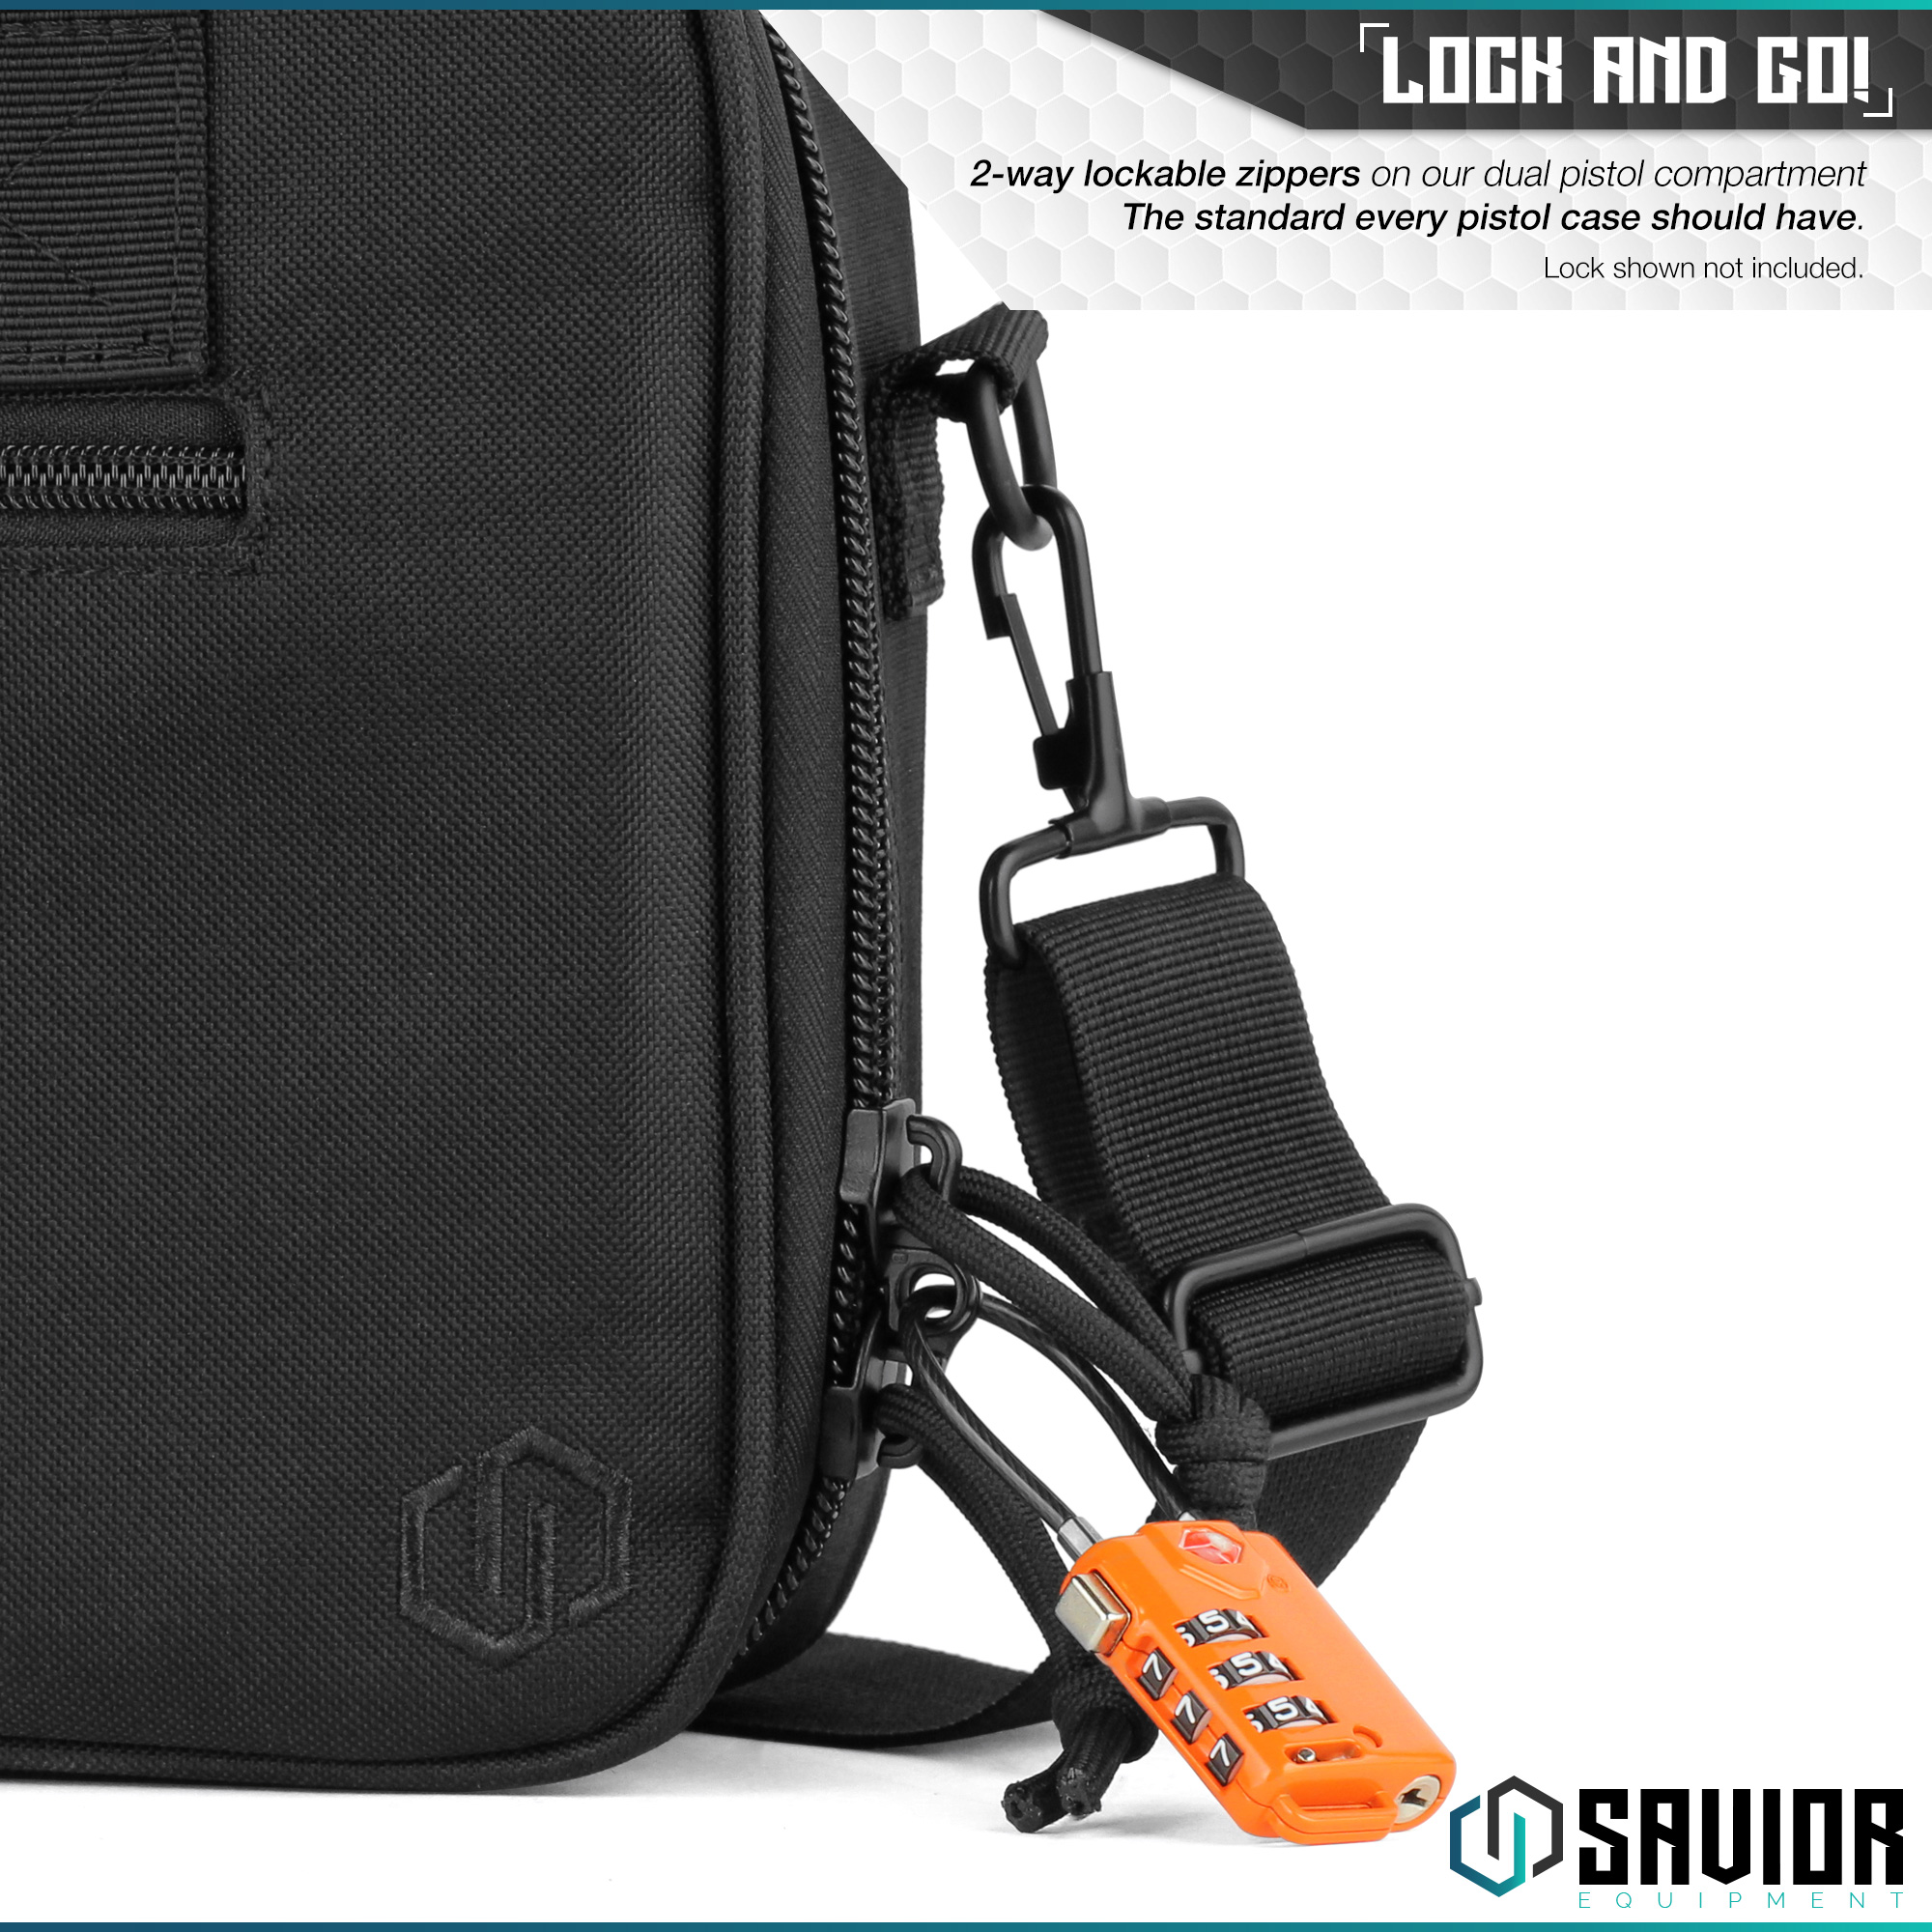 034-SAVIOR-034-Padded-Discreet-Double-Handgun-Bag-Pistol-Storage-Case-w-Mag-Pouch-Slot thumbnail 17